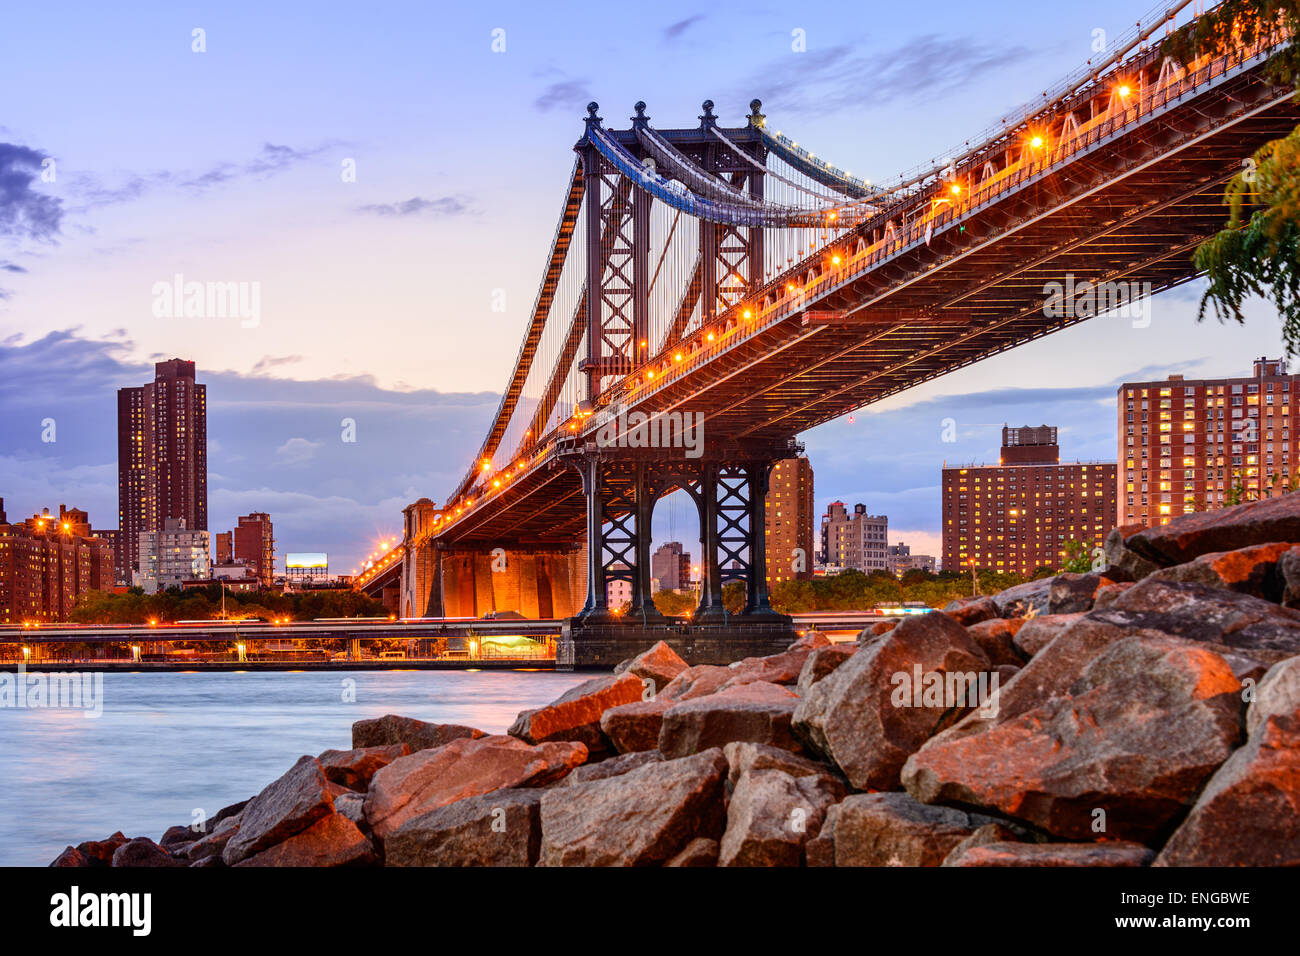 La città di New York, Stati Uniti d'America al Manhattan Bridge spanning l'East River. Immagini Stock